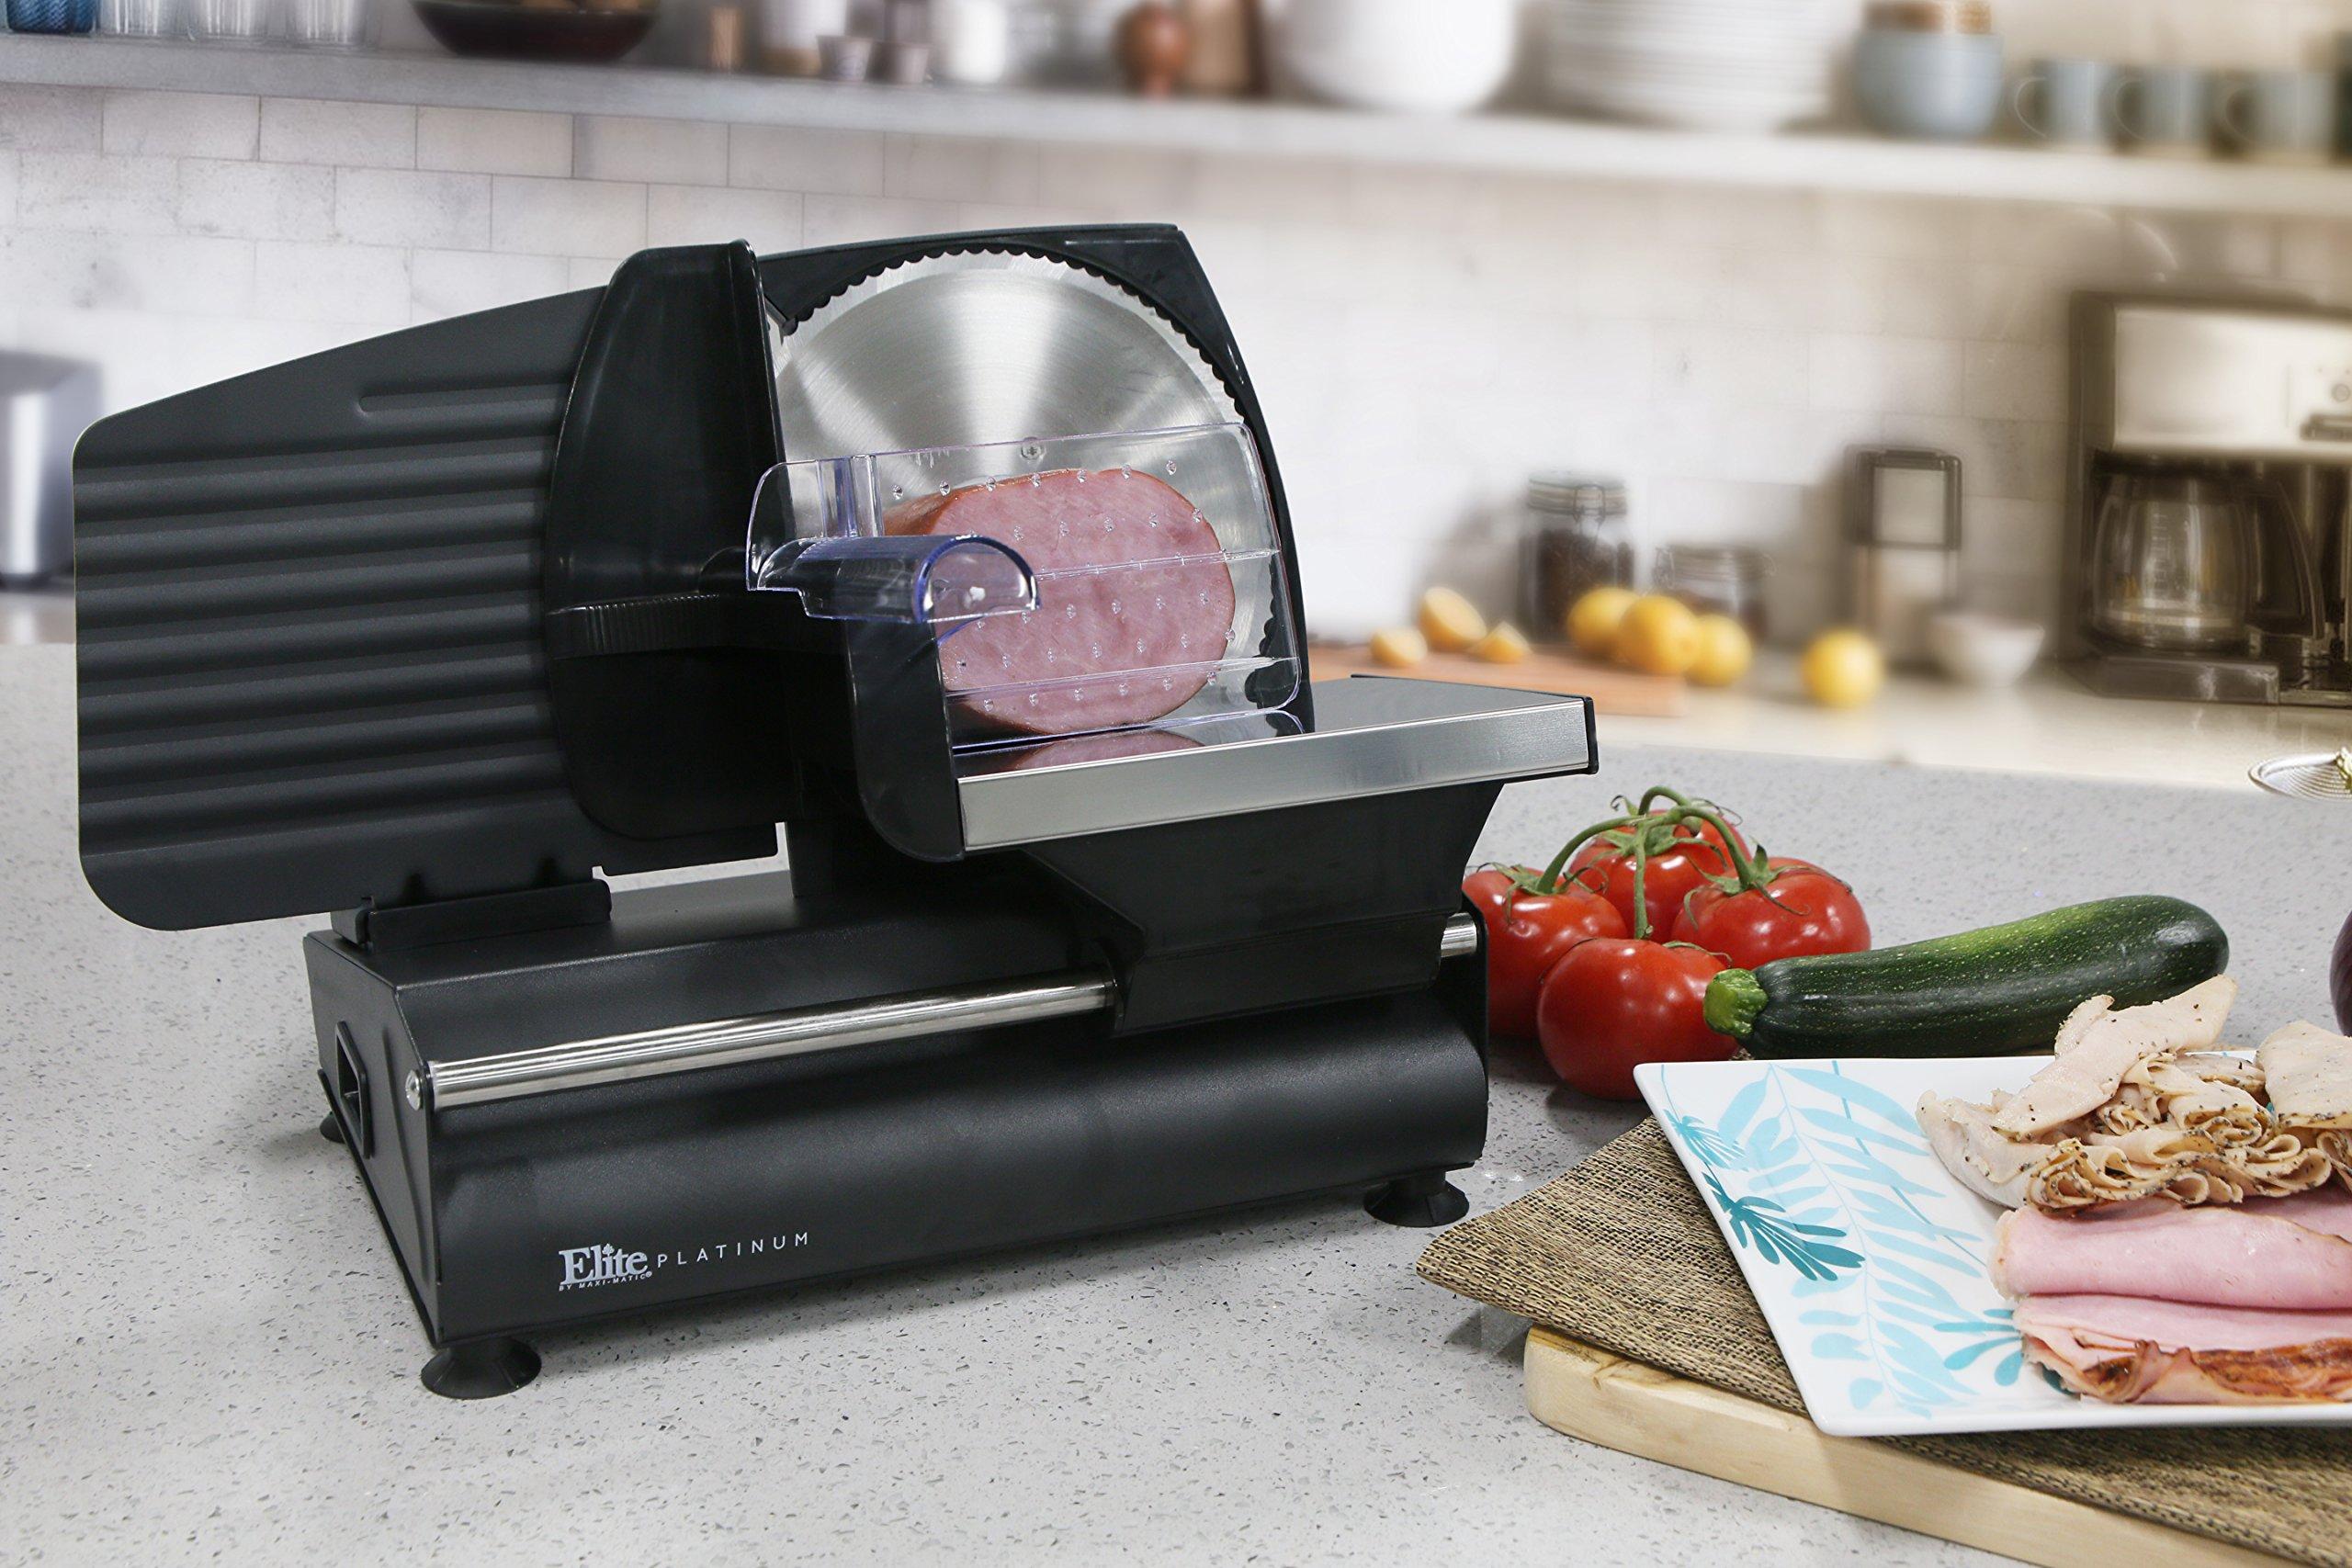 Elite Gourmet EMT-503B 130 Watt Die-Cast-Aluminum Electric Food Slicer, Black by Maxi-Matic (Image #5)